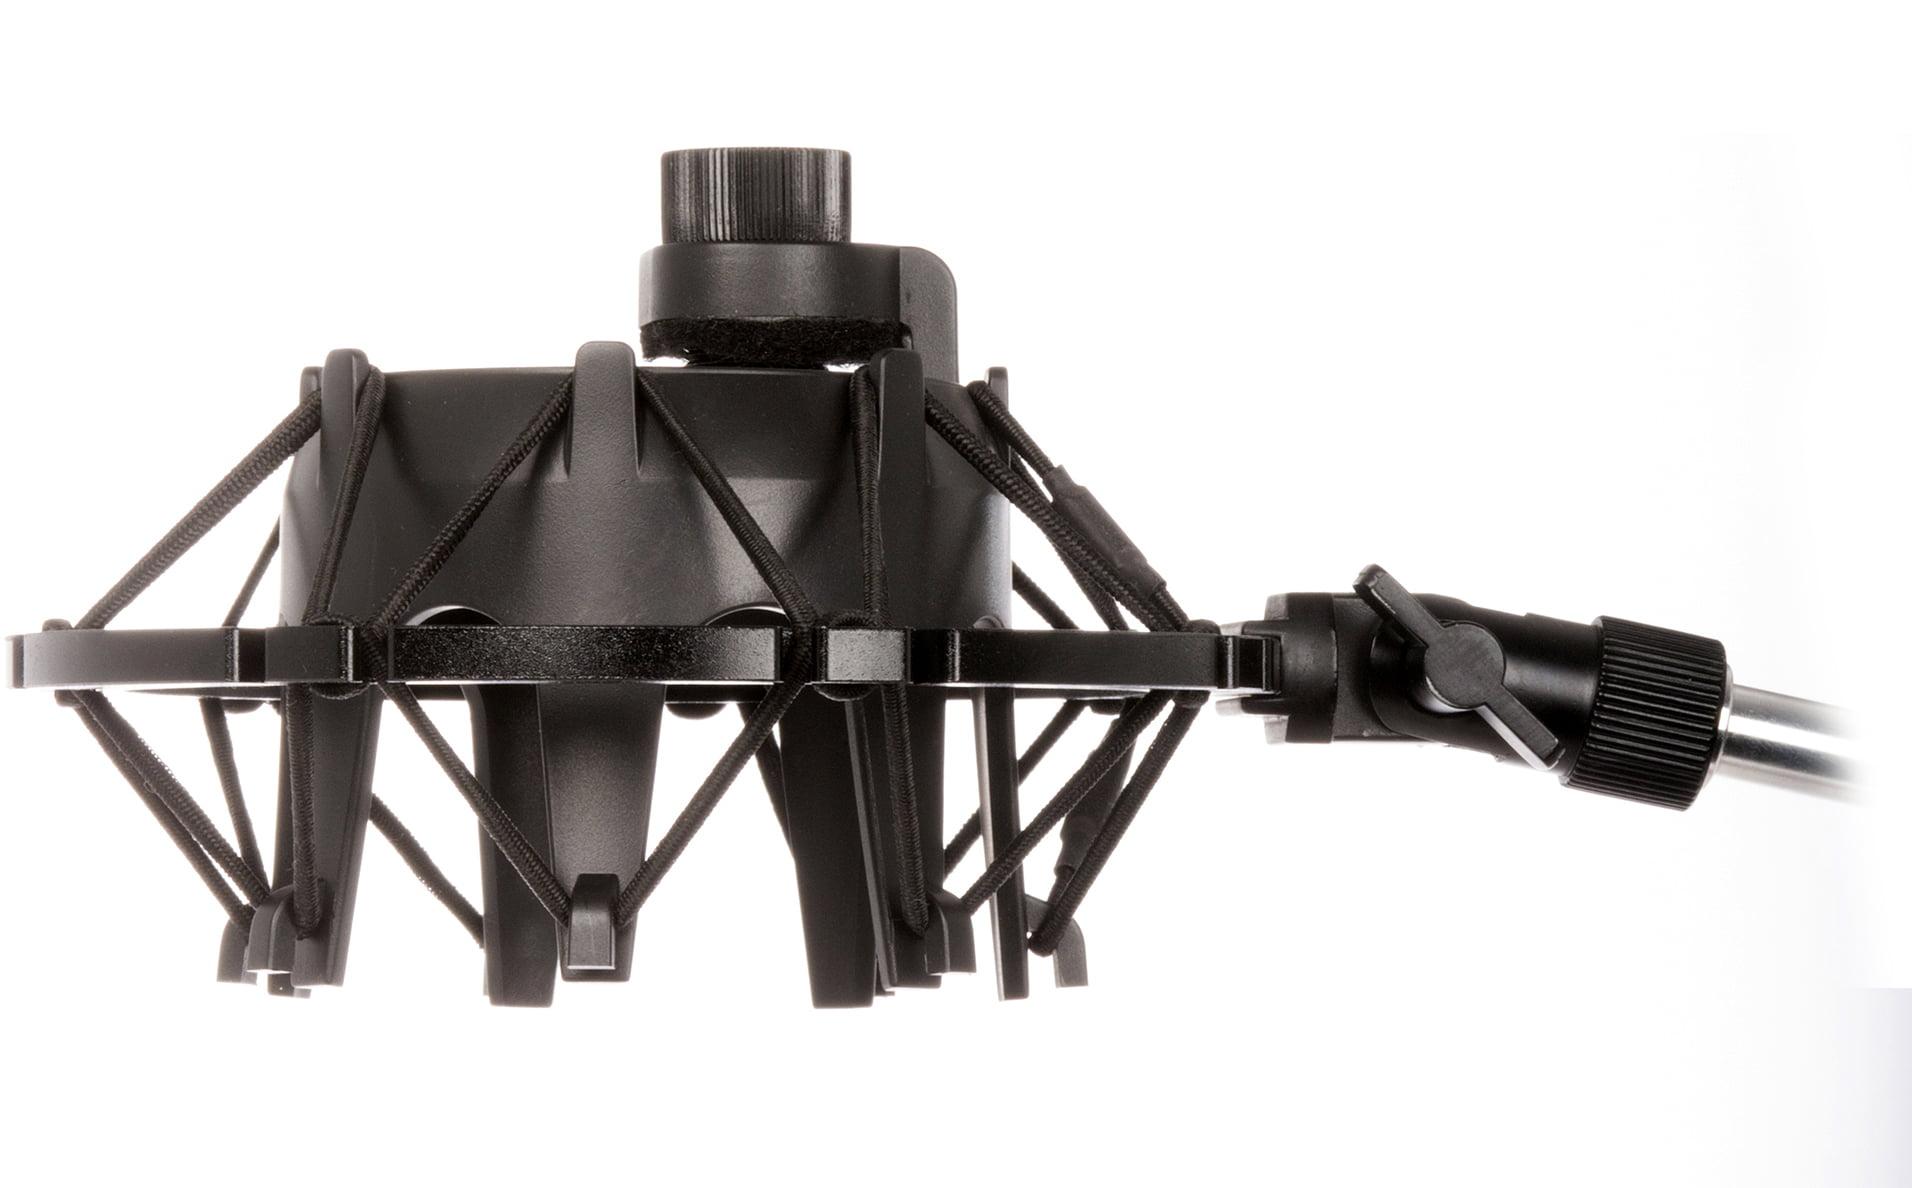 Knox Gear Blue Yeti Microphone Shock Mount (Black) by Knox